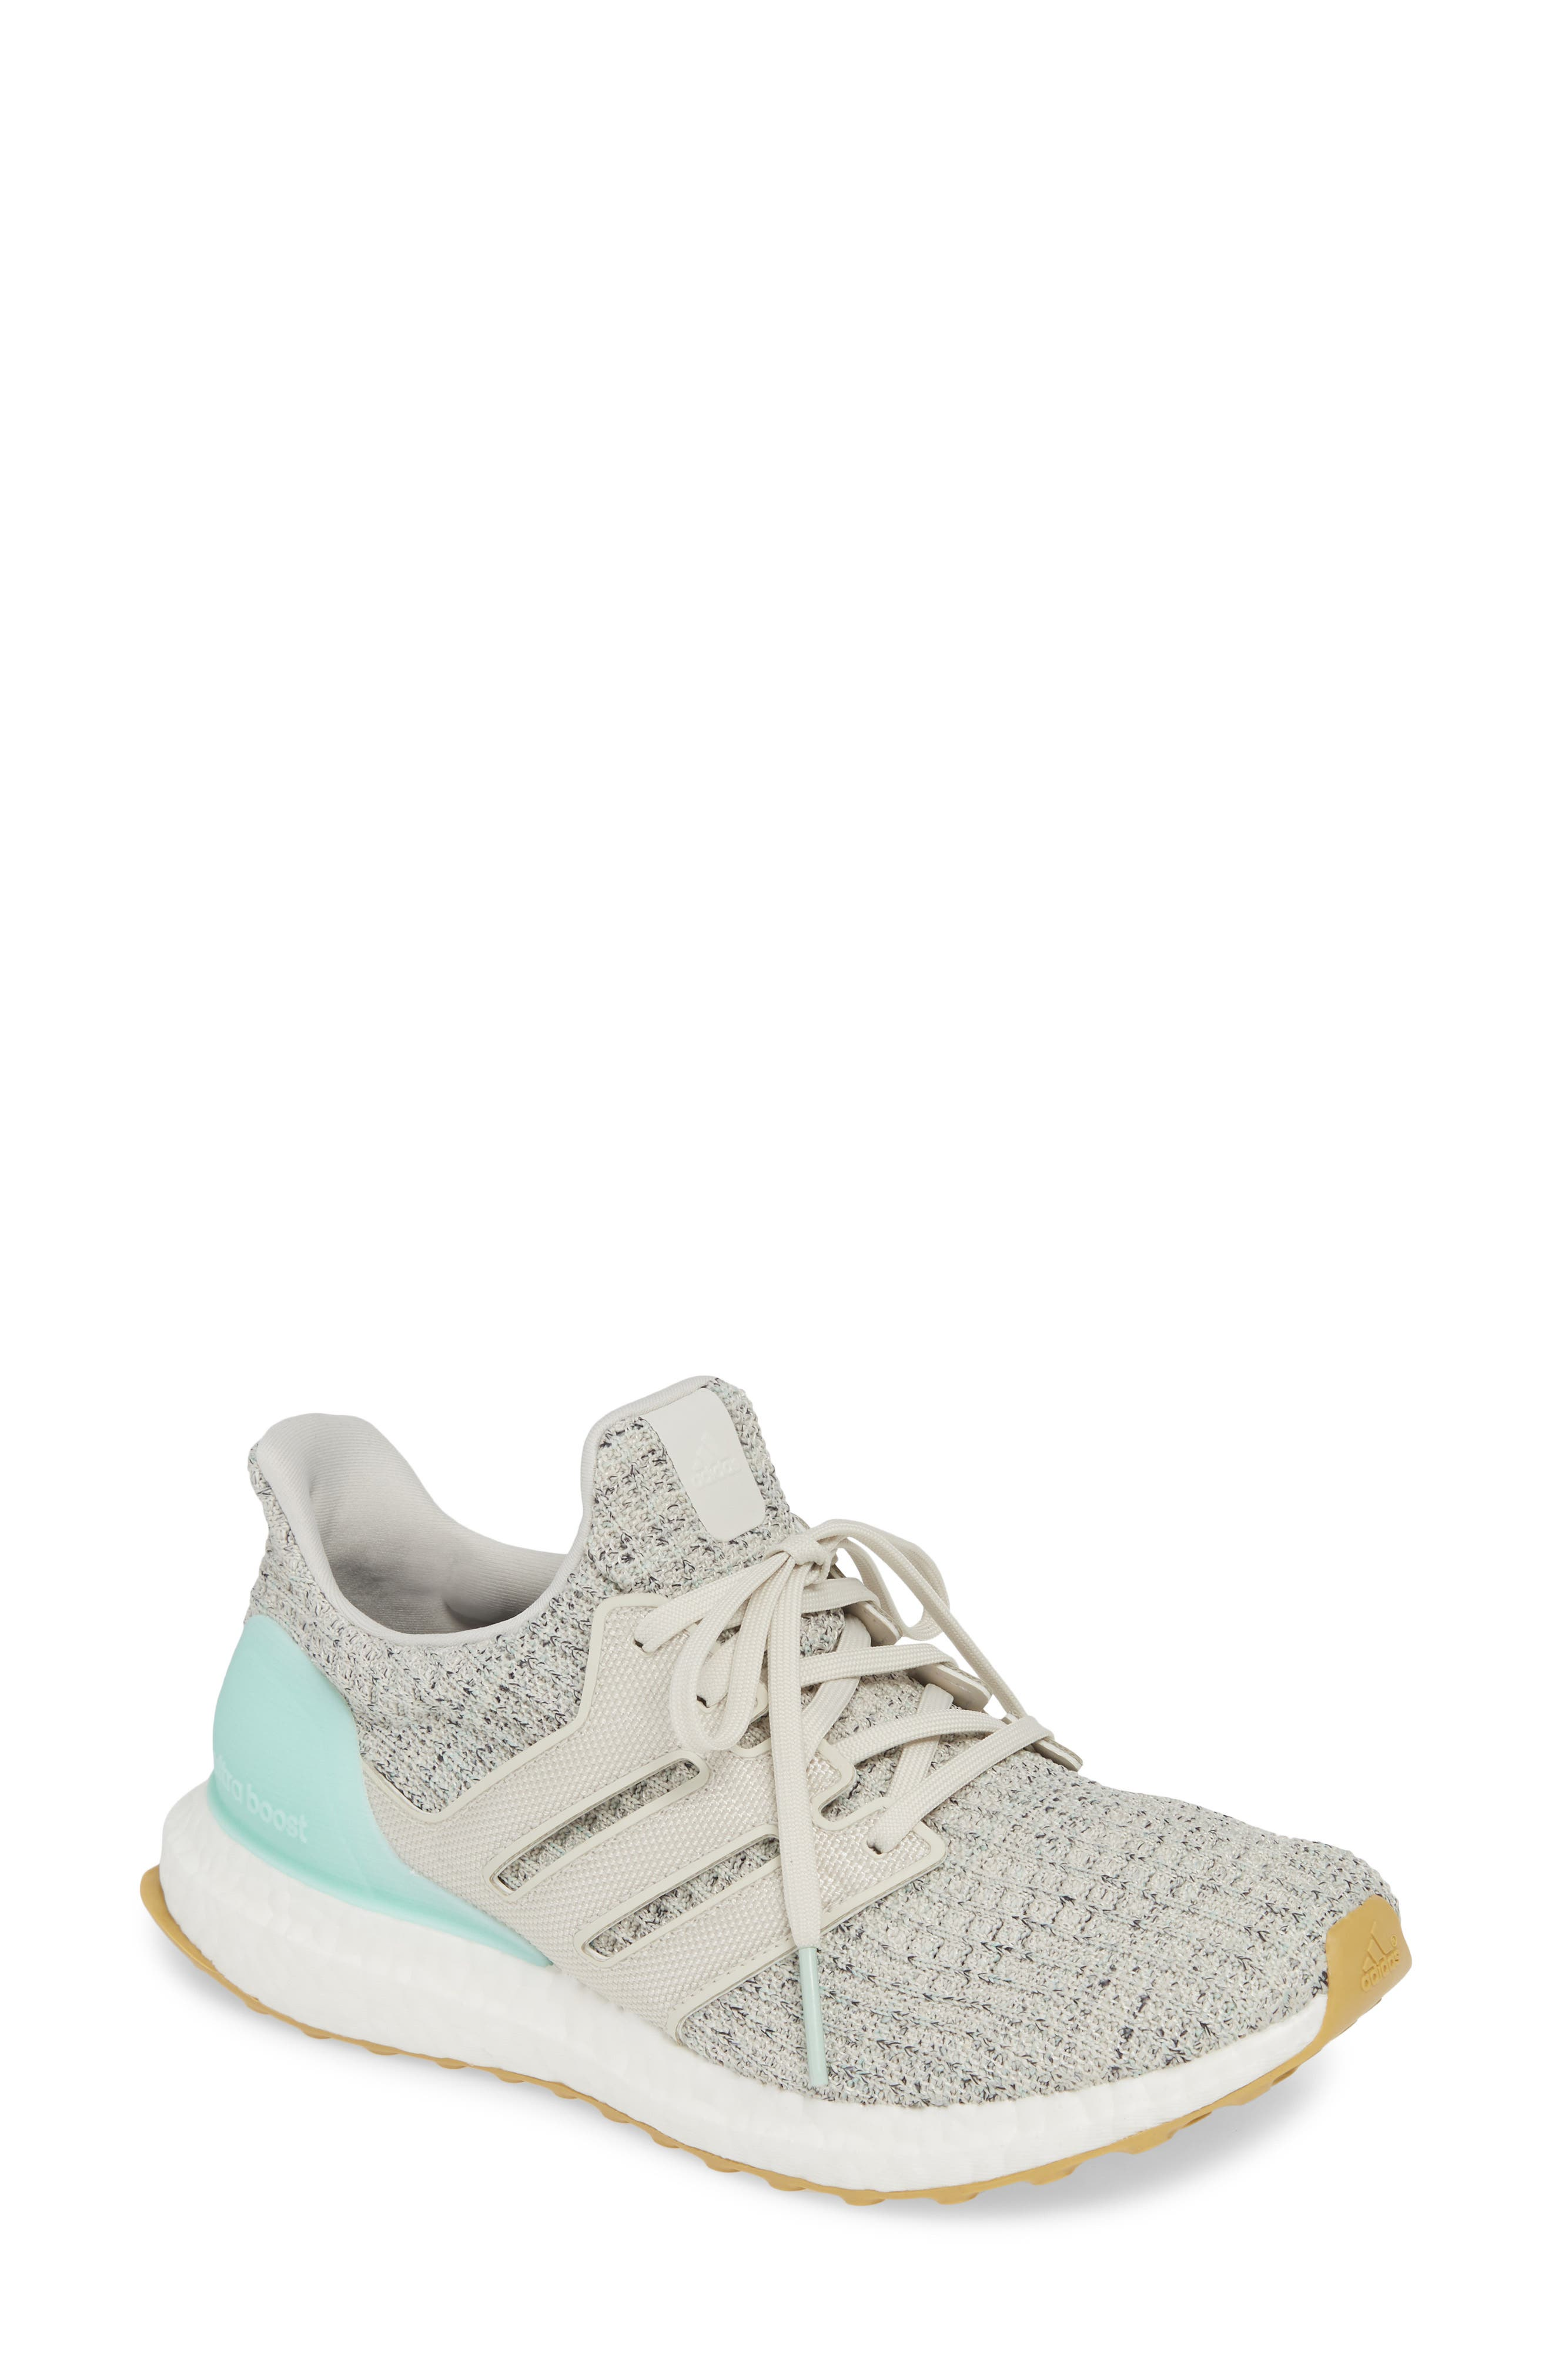 e3b67f947dc97 Adidas  Ultraboost  Running Shoe   4.5 Men s- Grey